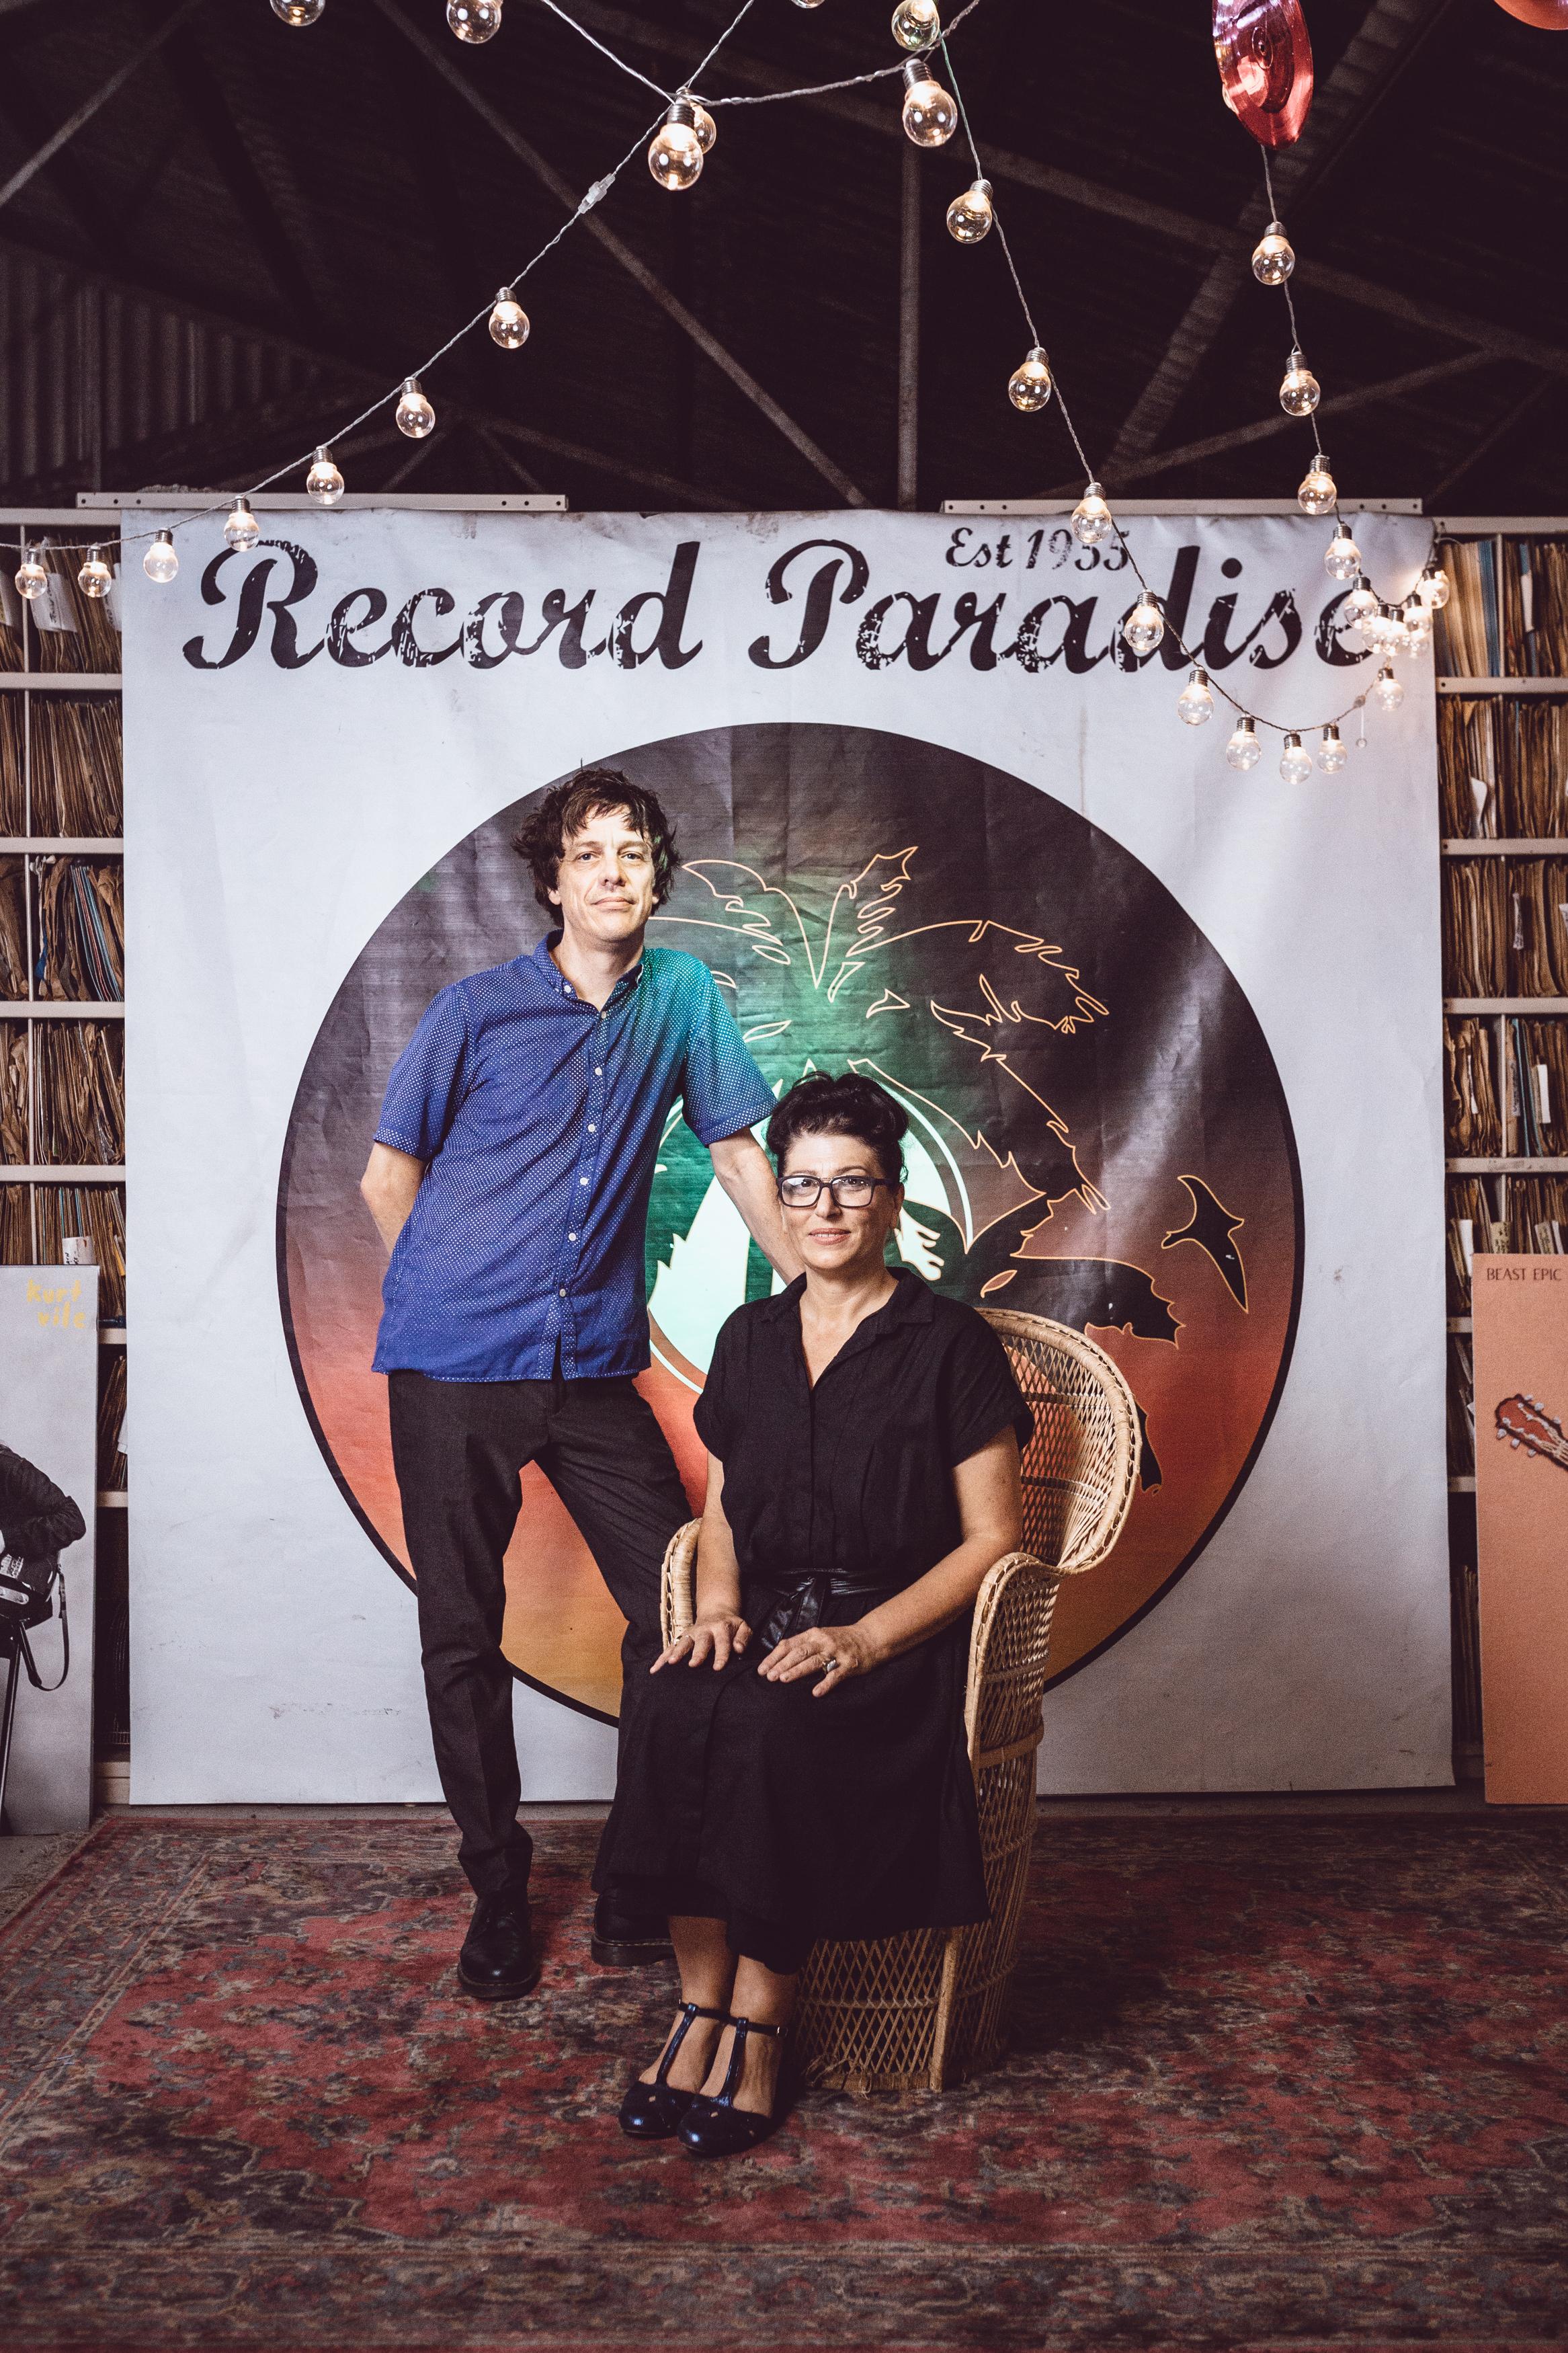 Record_Paradise-14.jpg